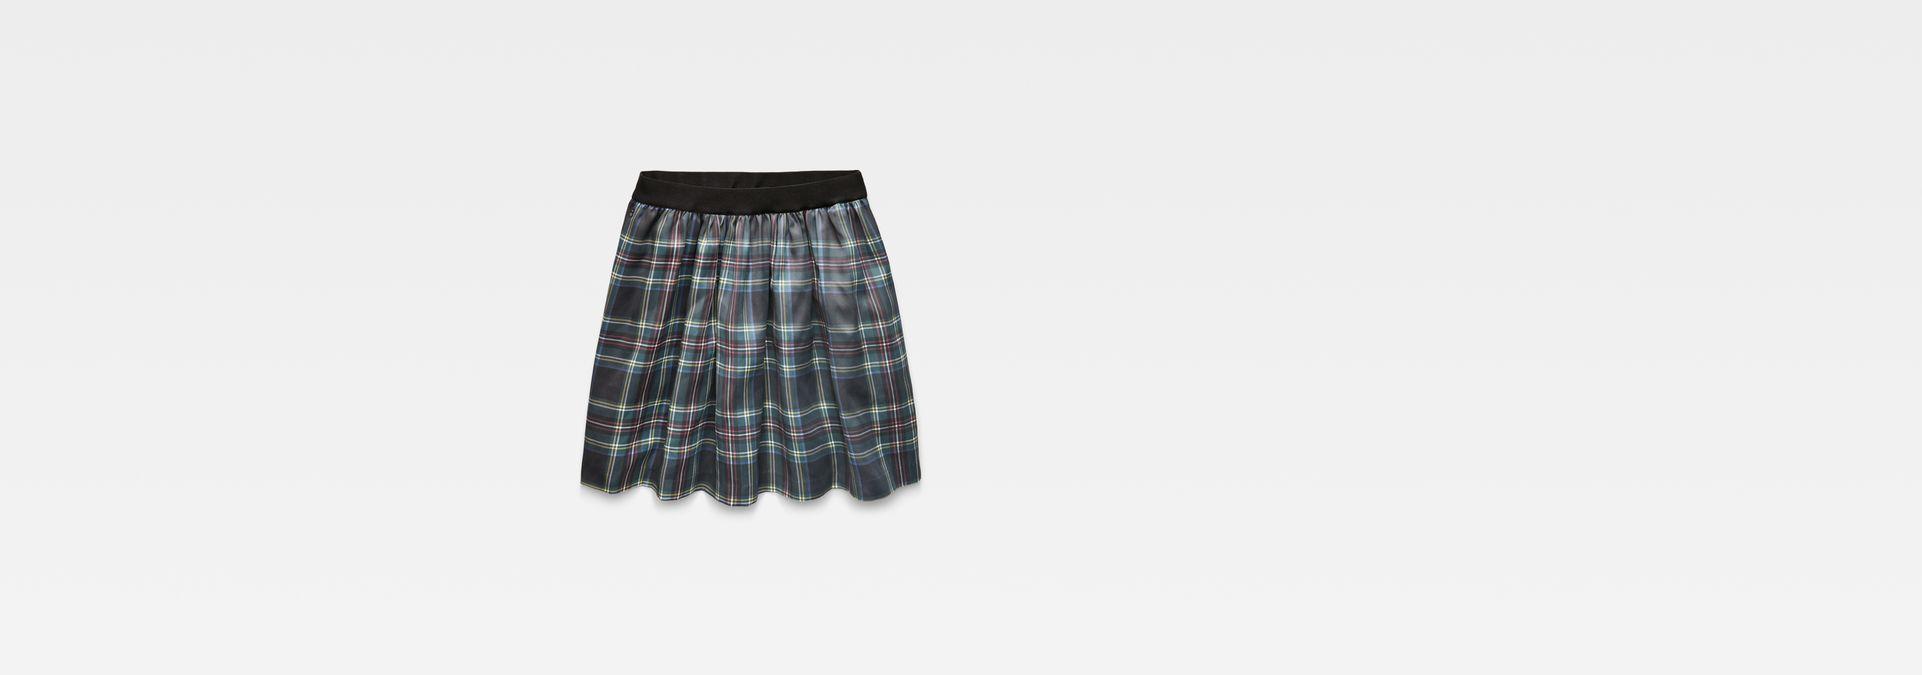 4705be10b82 ... model back zoom · G-Star RAW® G-Star Flared Mini Skirt Black flat front  ...